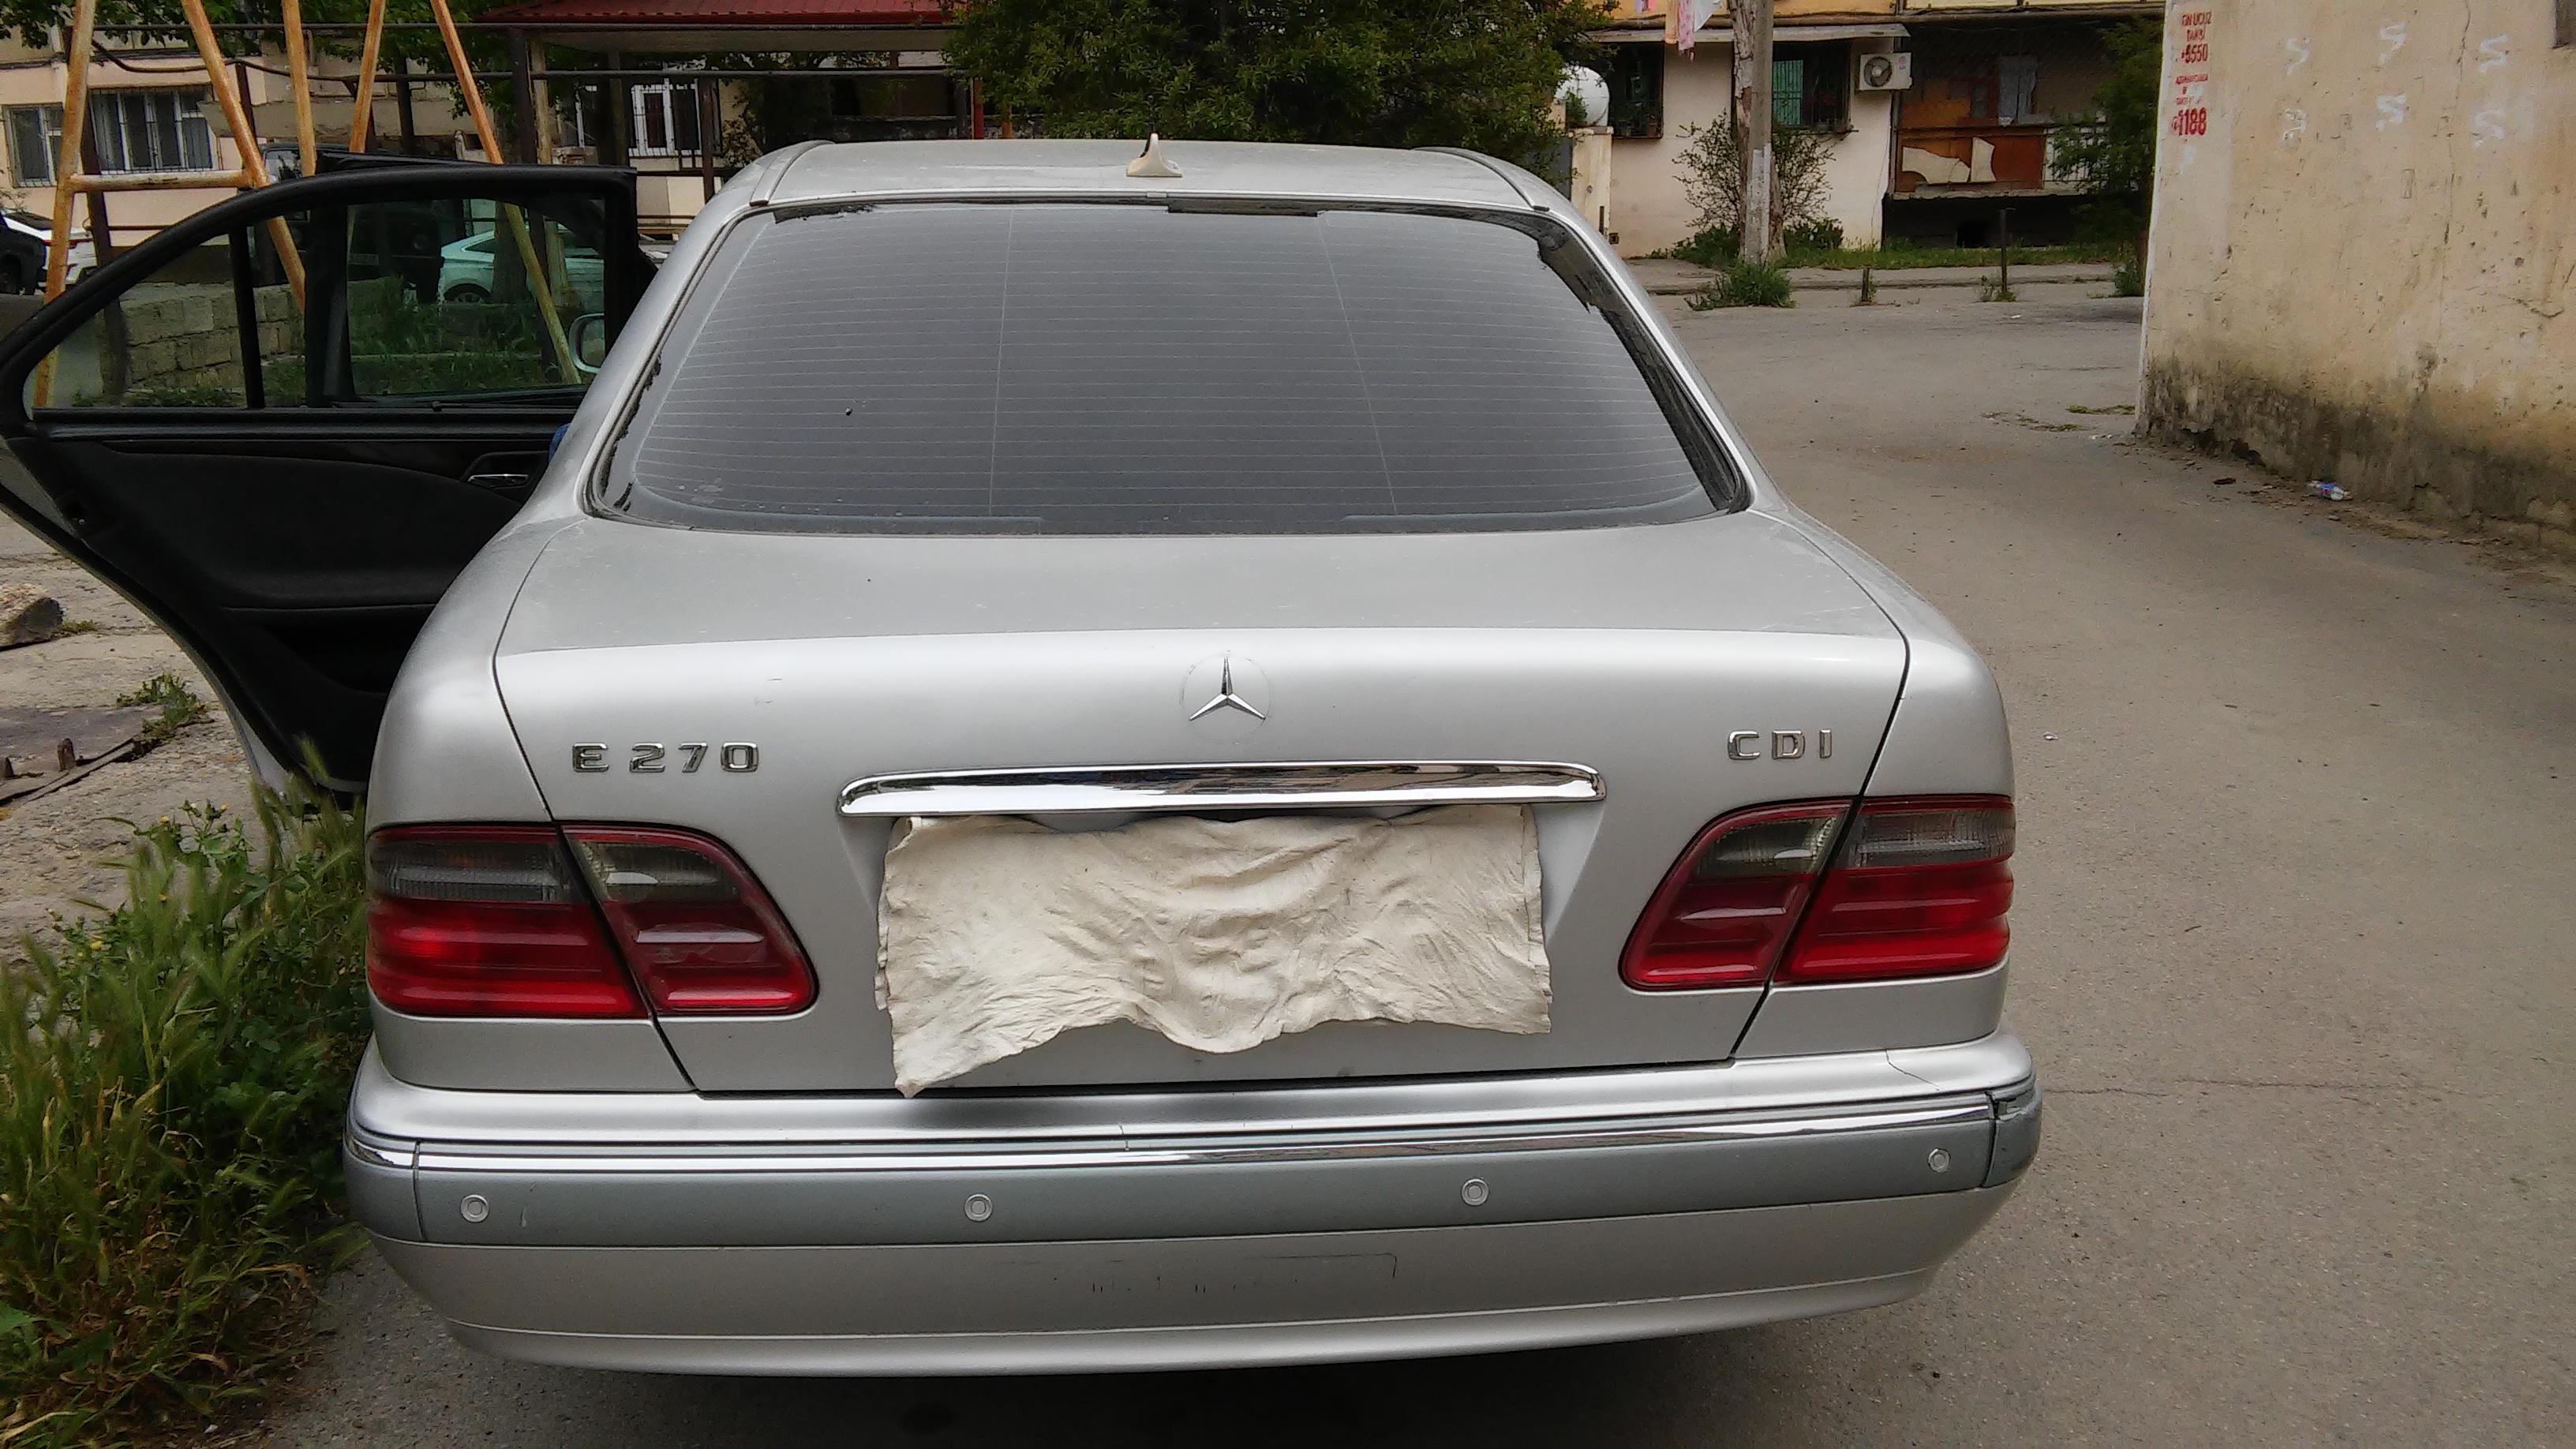 Mercedes-Benz E 270 2.7(lt) 2001 İkinci əl  $15000